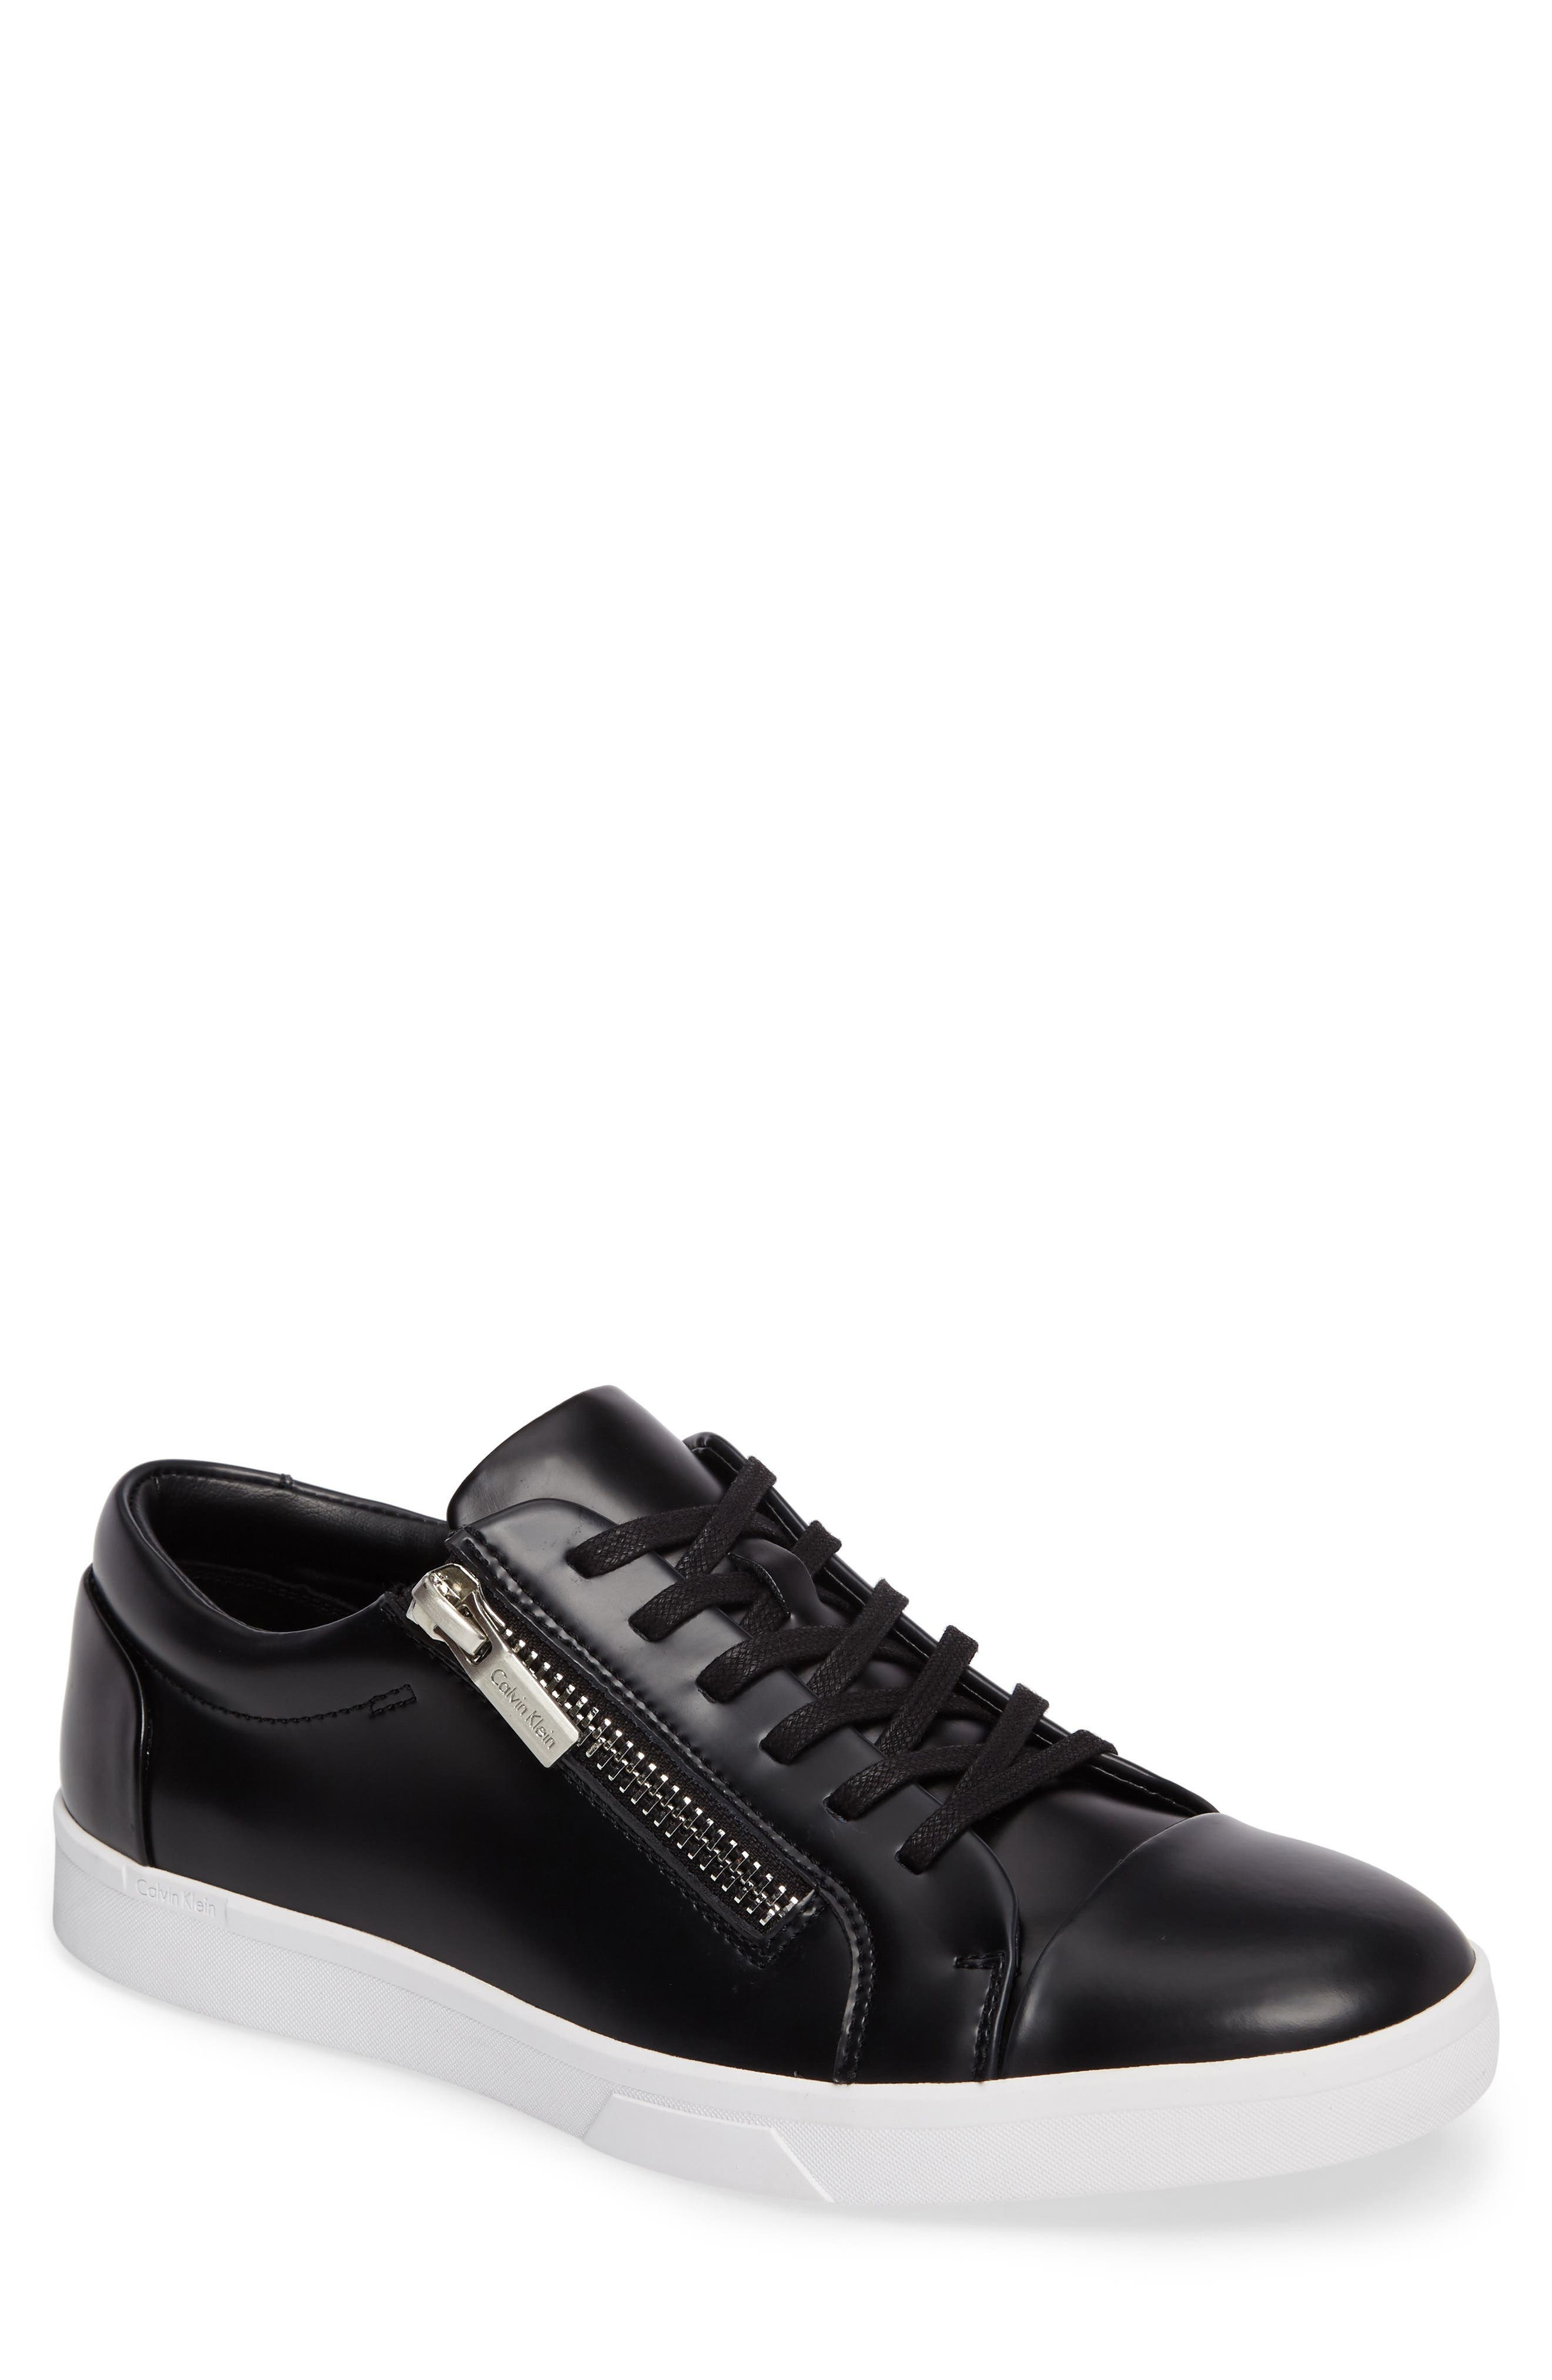 Ibrahim Cap-Toe Zip Sneaker,                             Main thumbnail 1, color,                             Black Leather